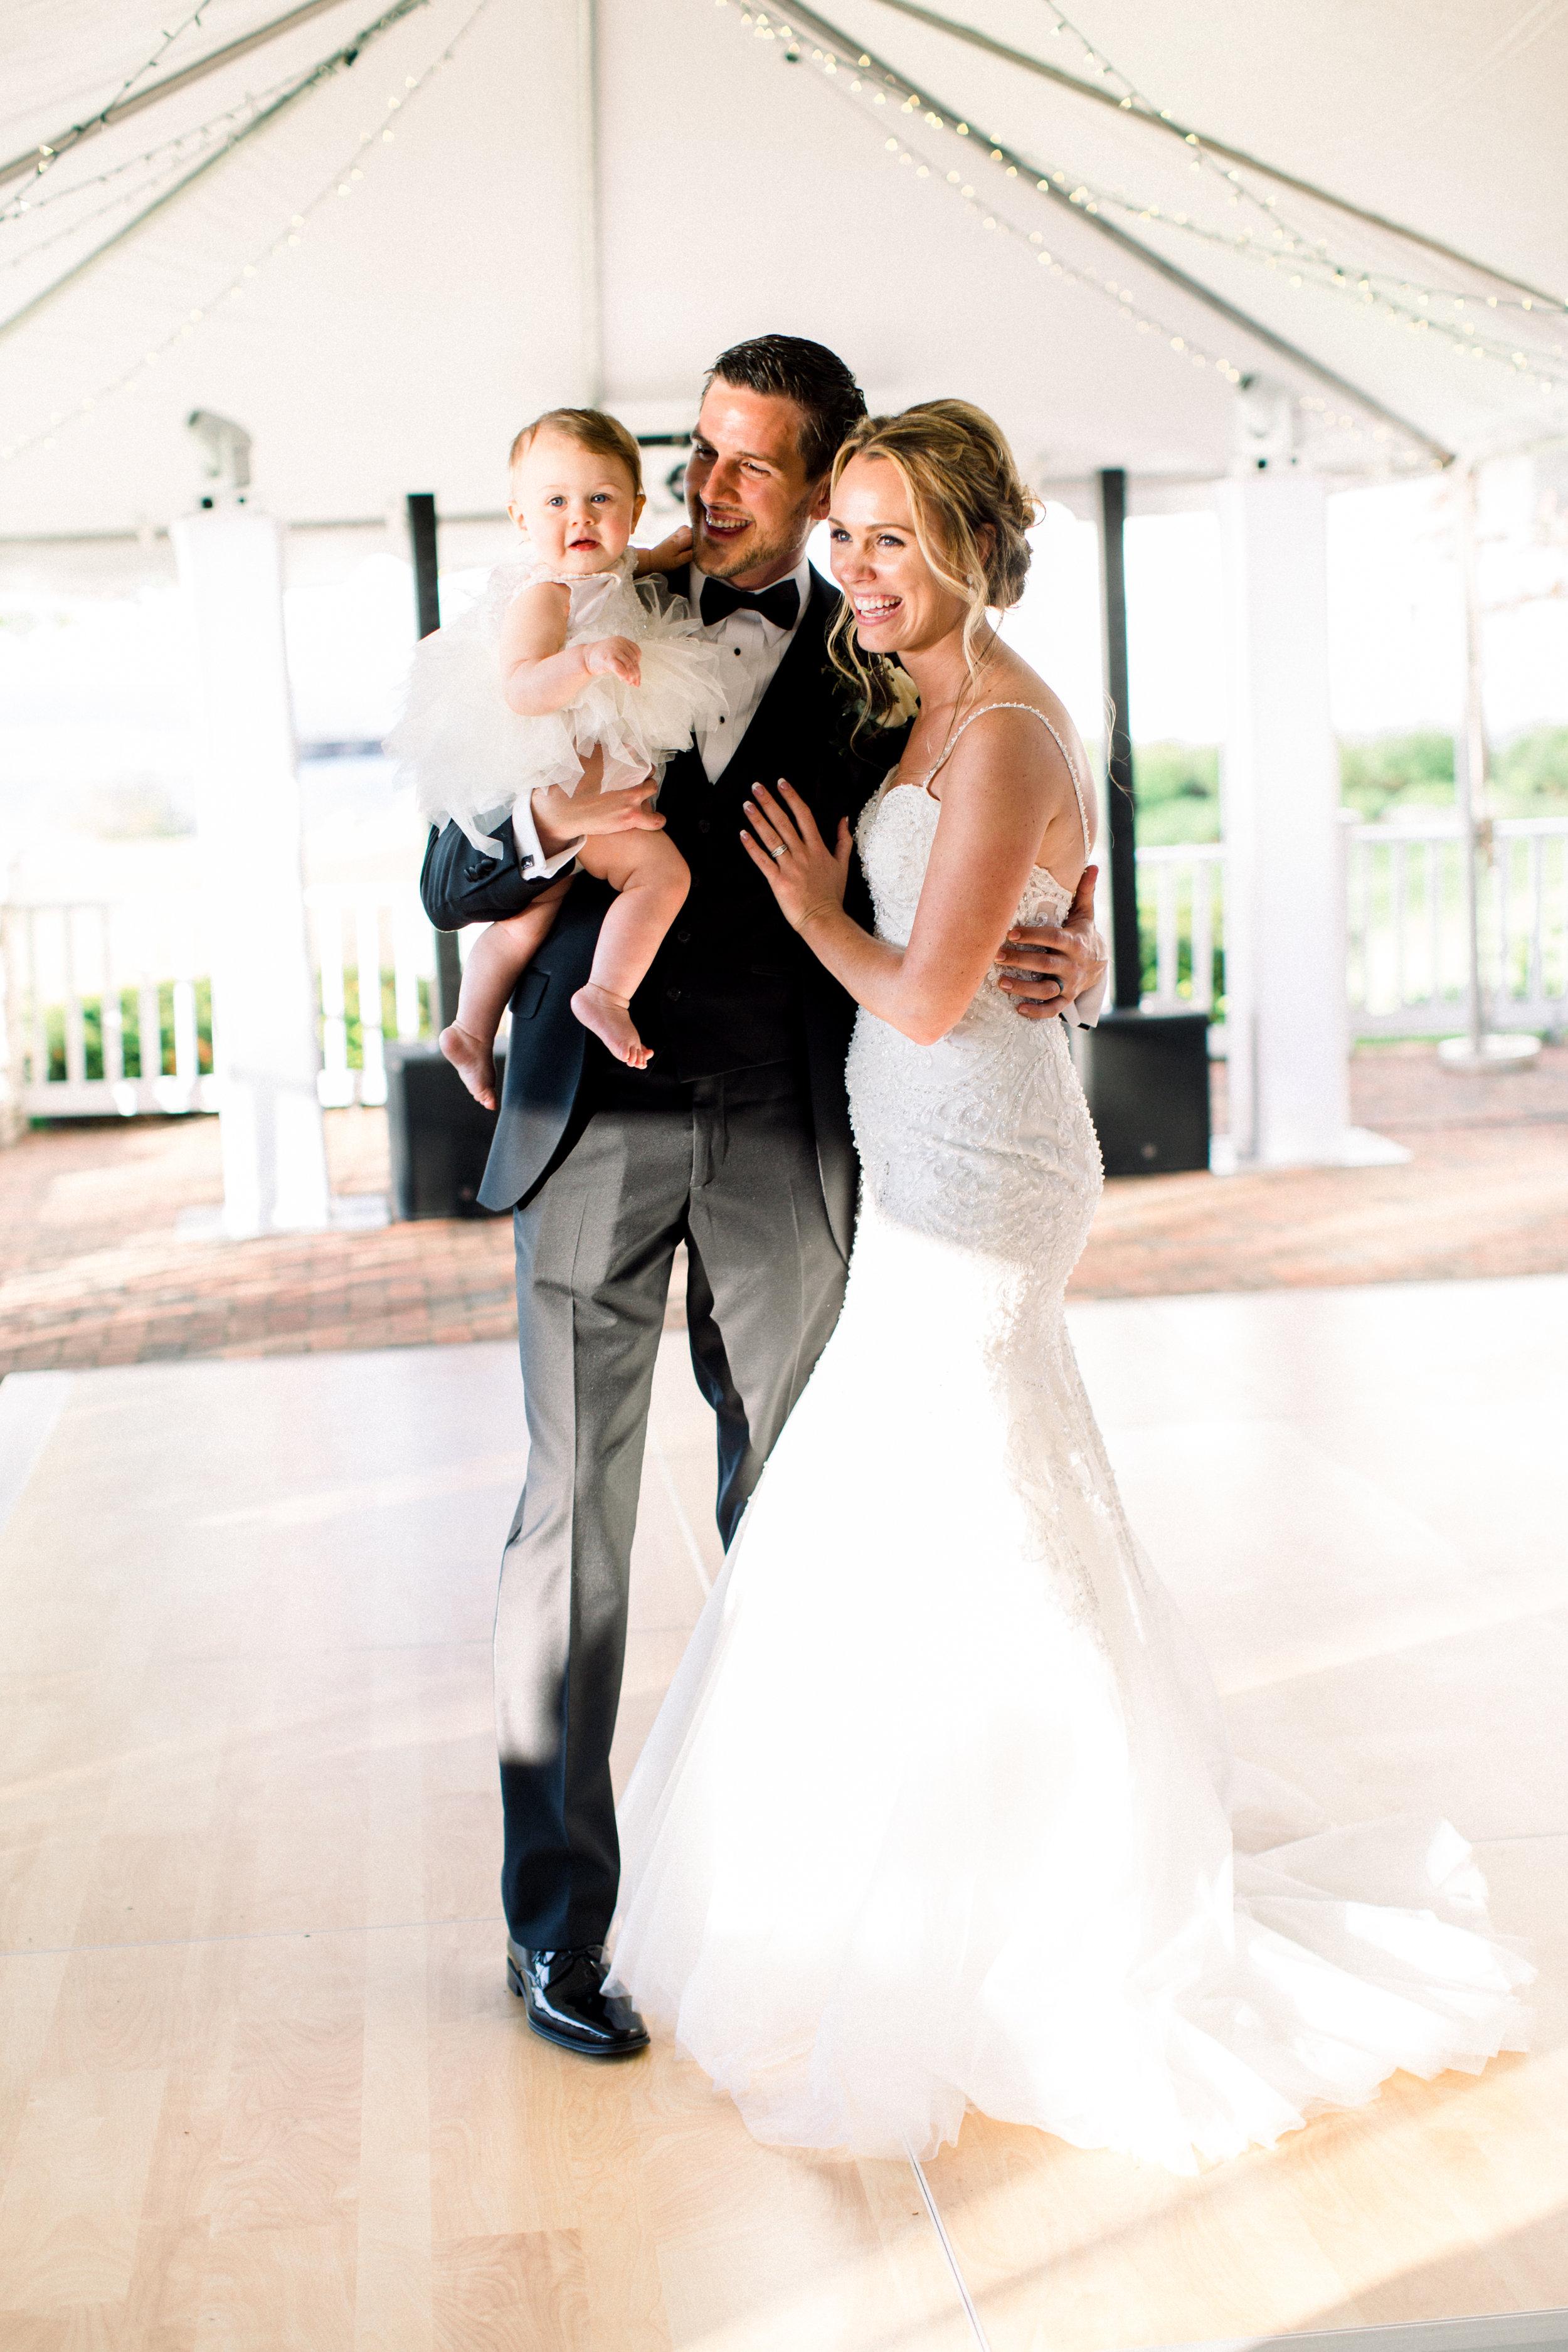 Noss+Wedding+Reception+ Dances-18.jpg